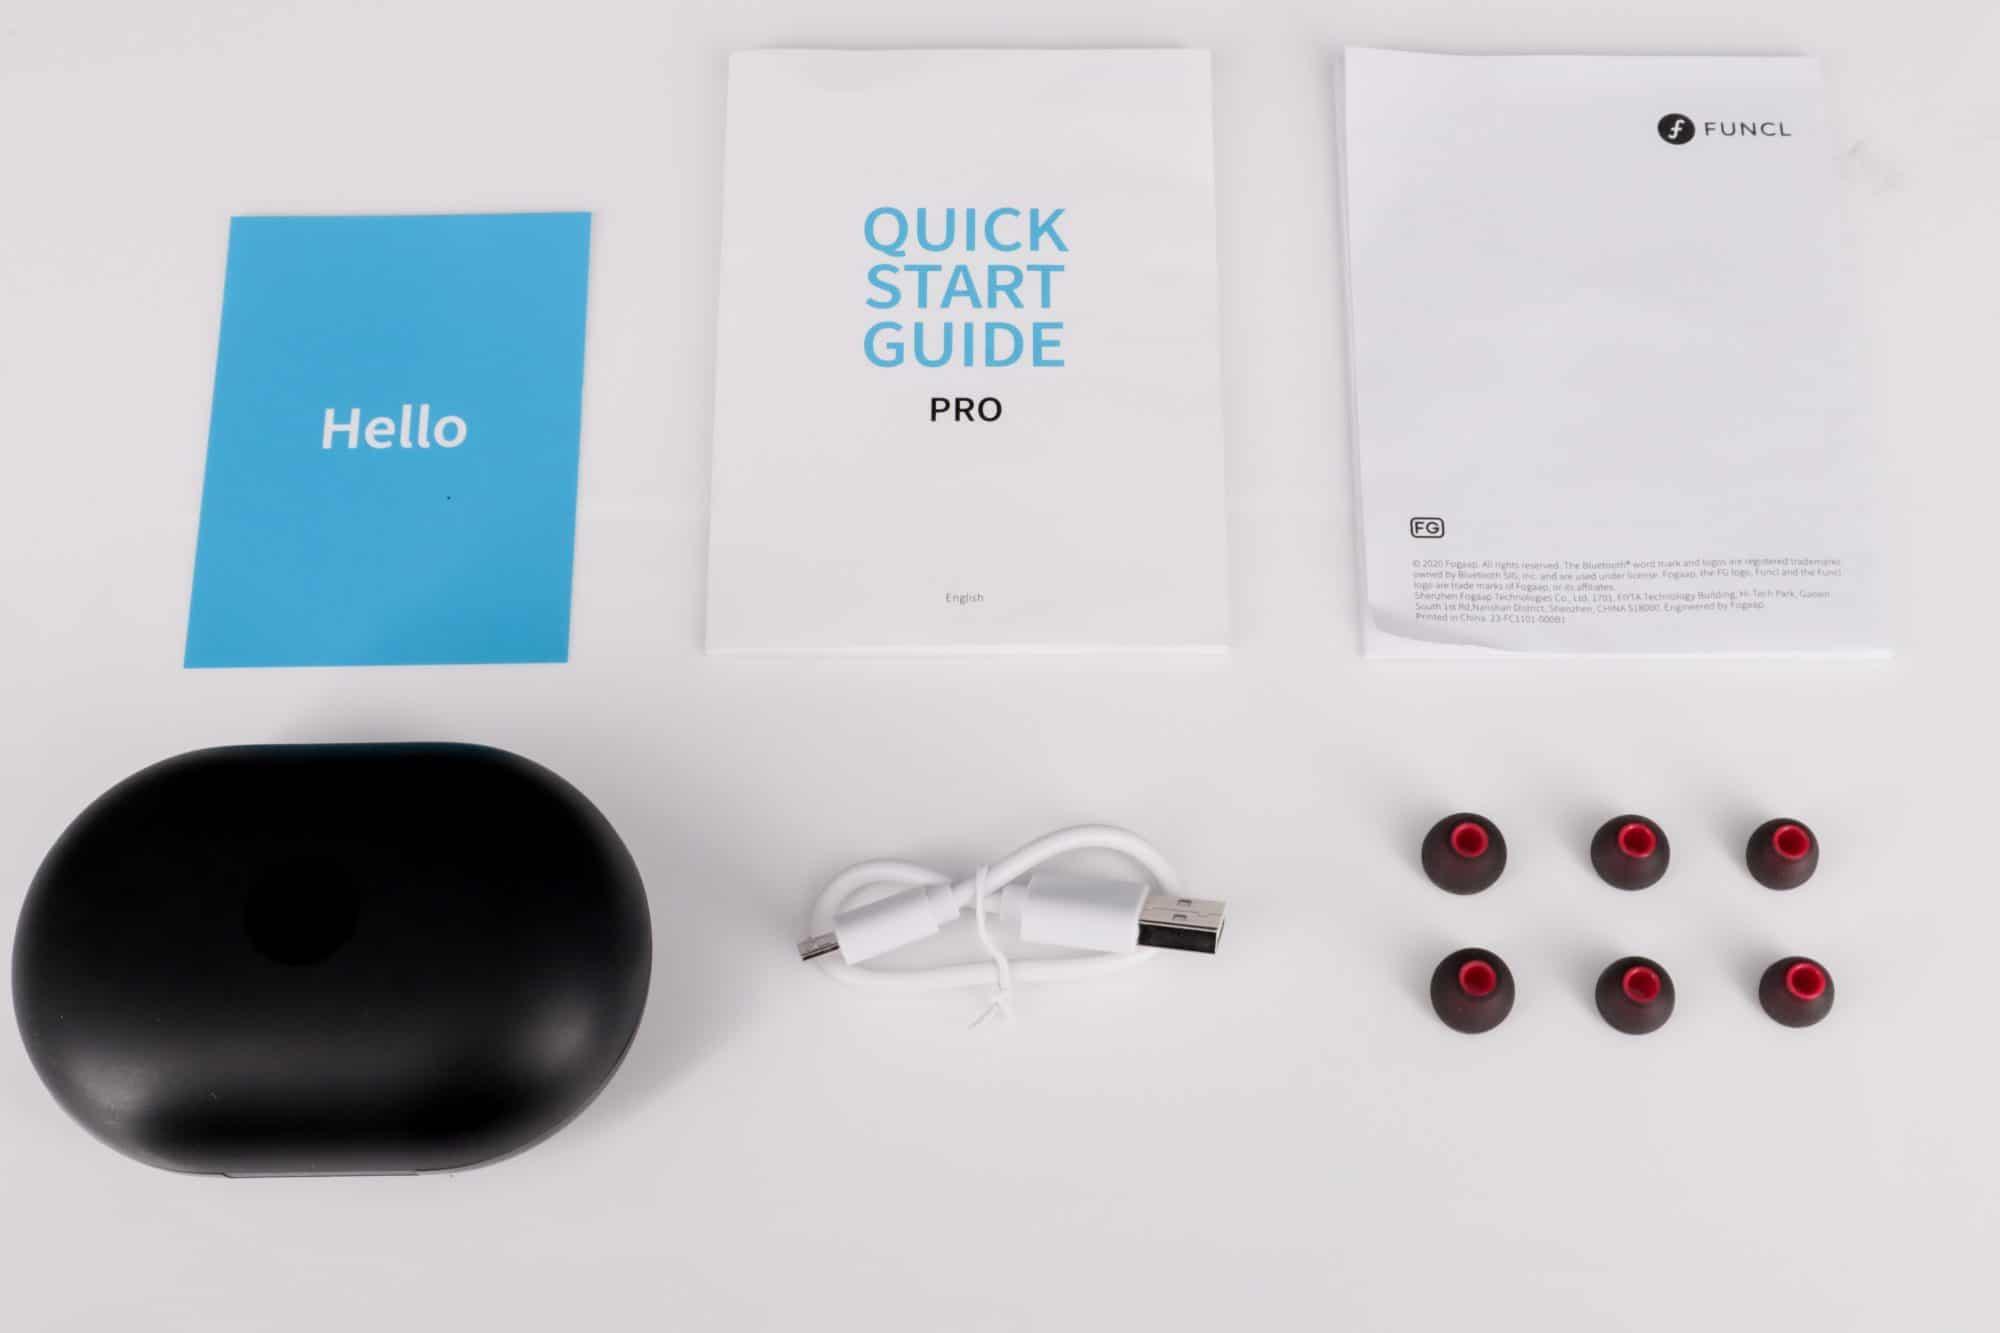 Beats 以外運動防水首選!funcl Pro耳掛式真無線藍牙耳機推薦開箱